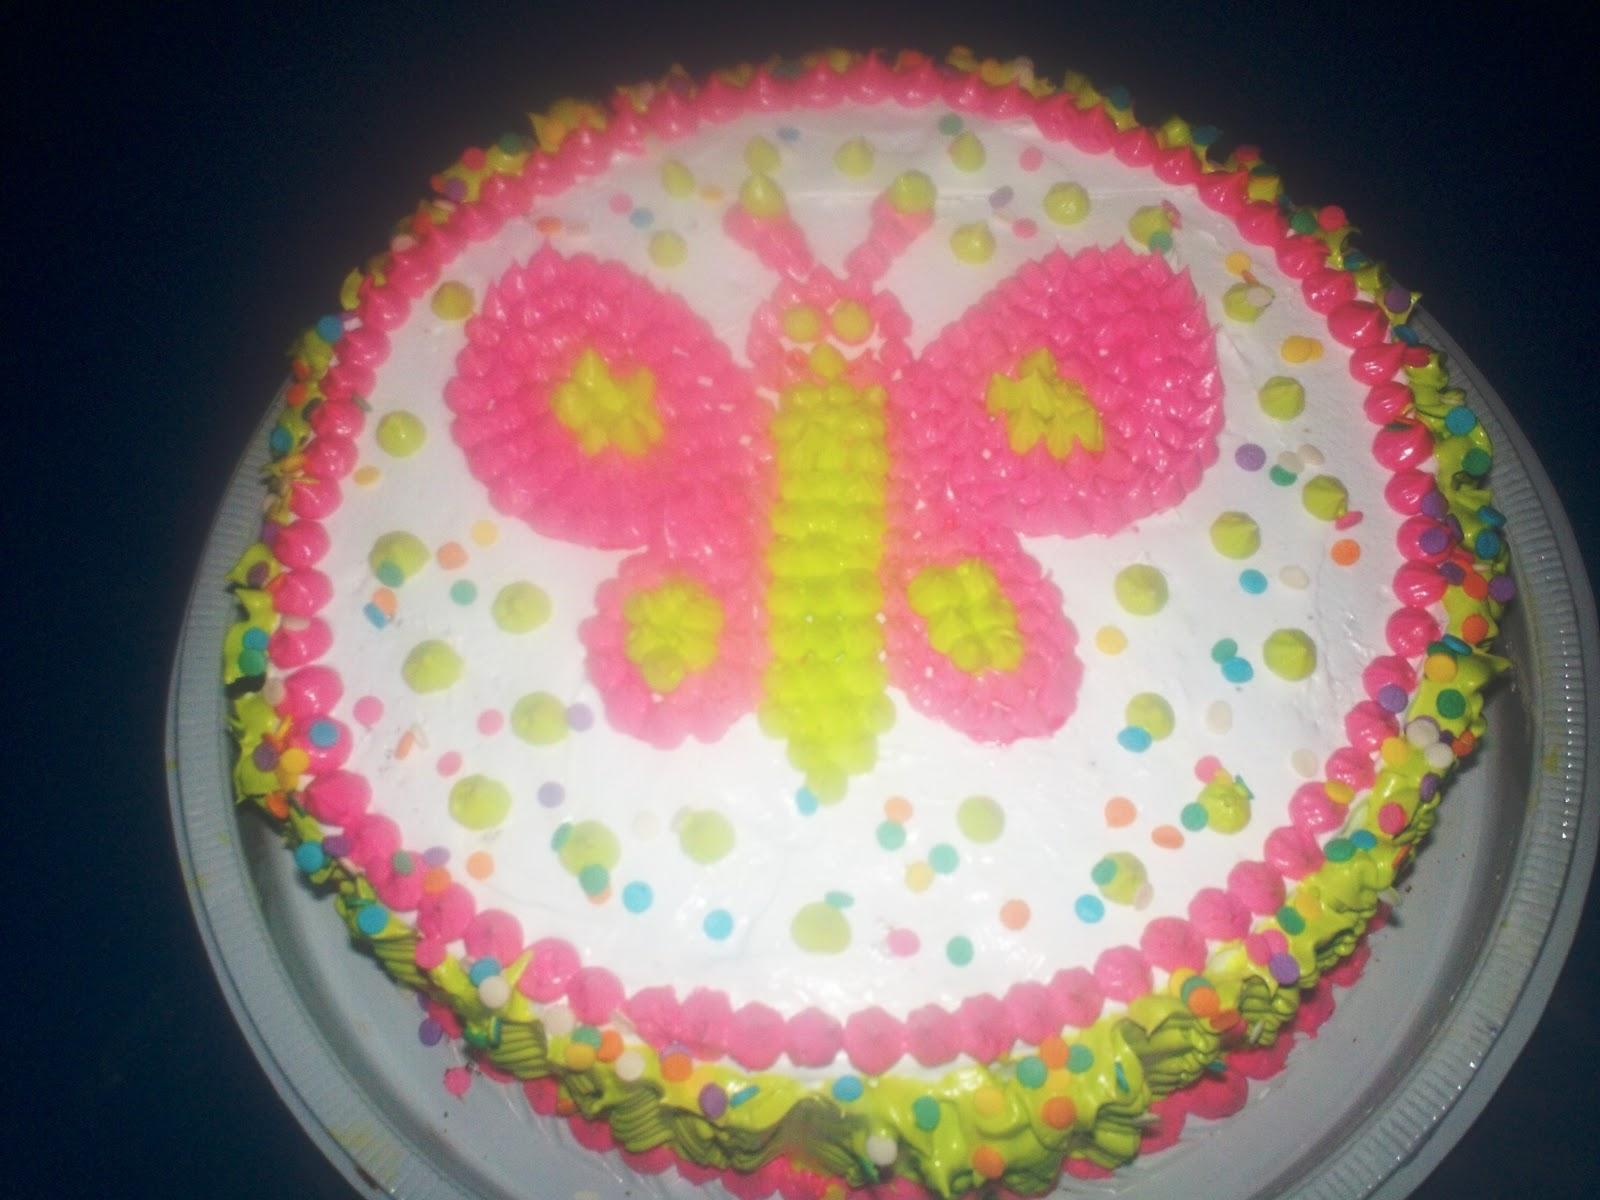 Lidy lapa bolos e decoraes bolo borboleta bolo borboleta altavistaventures Image collections